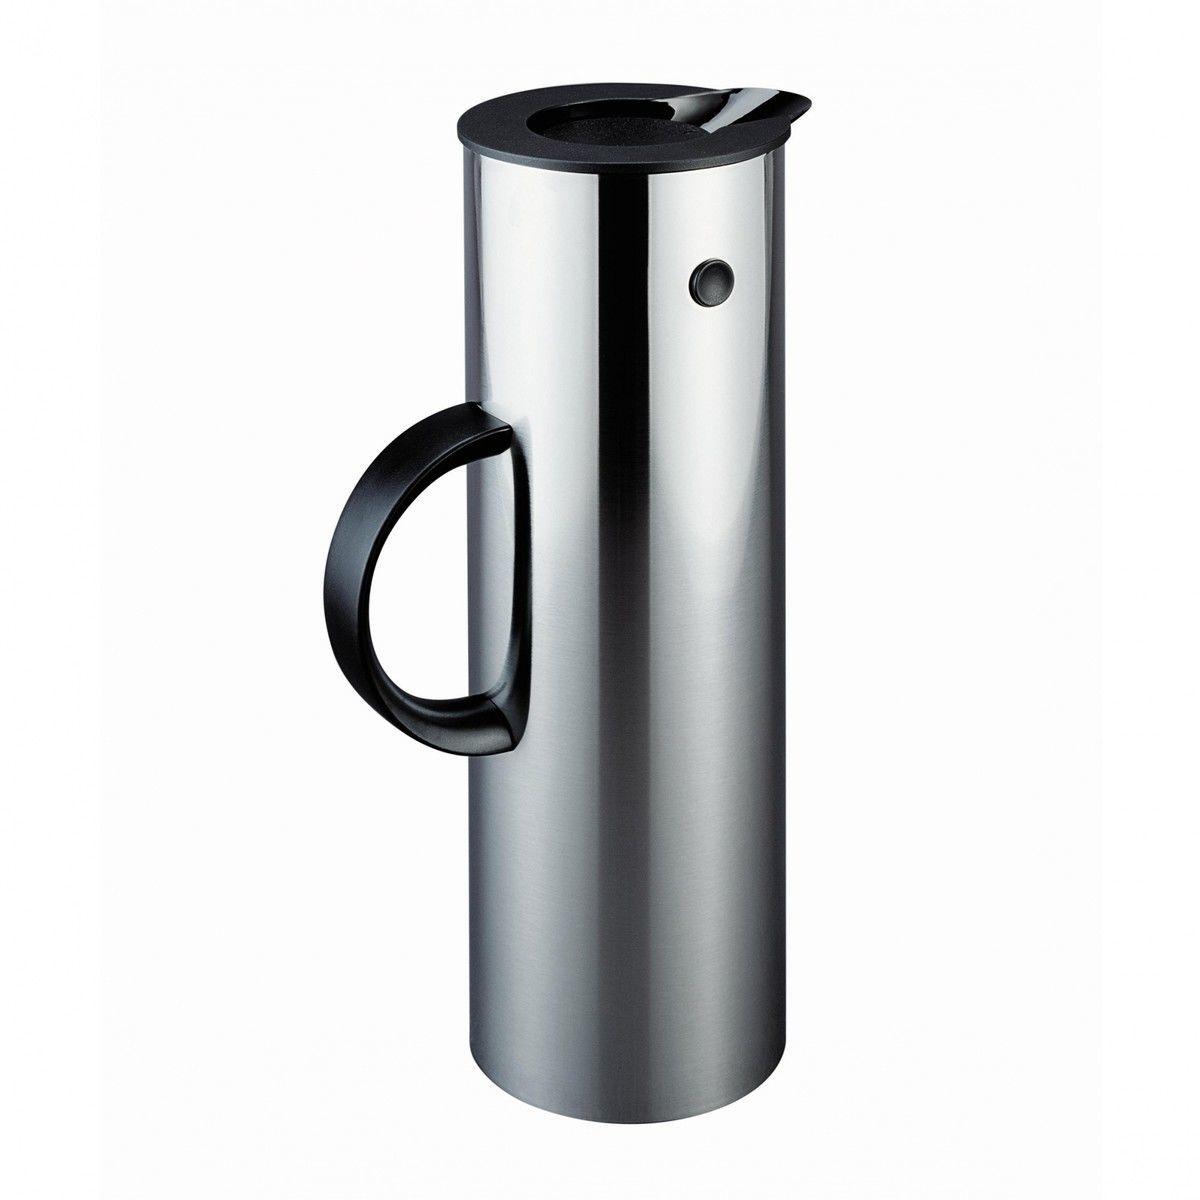 stelton vacuum jug hot metal edition 1l stelton. Black Bedroom Furniture Sets. Home Design Ideas